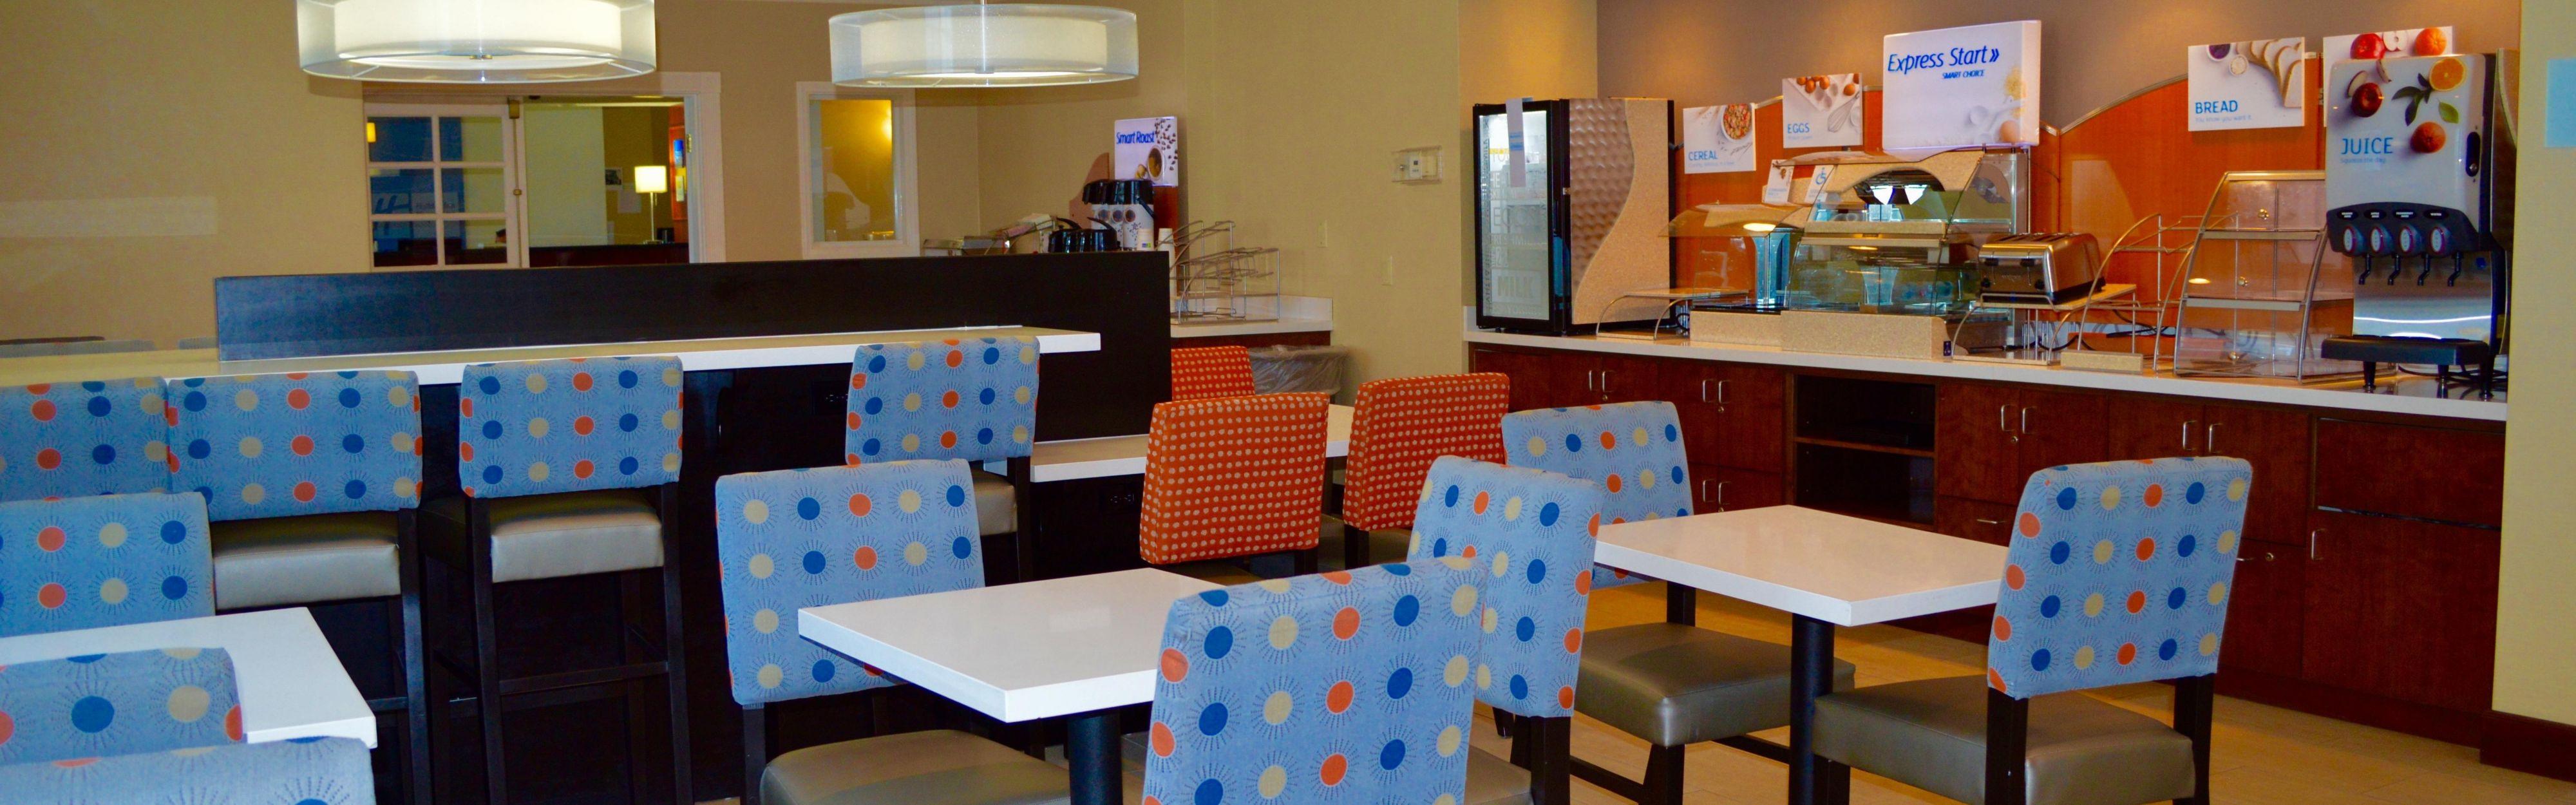 Holiday Inn Express Calexico image 3